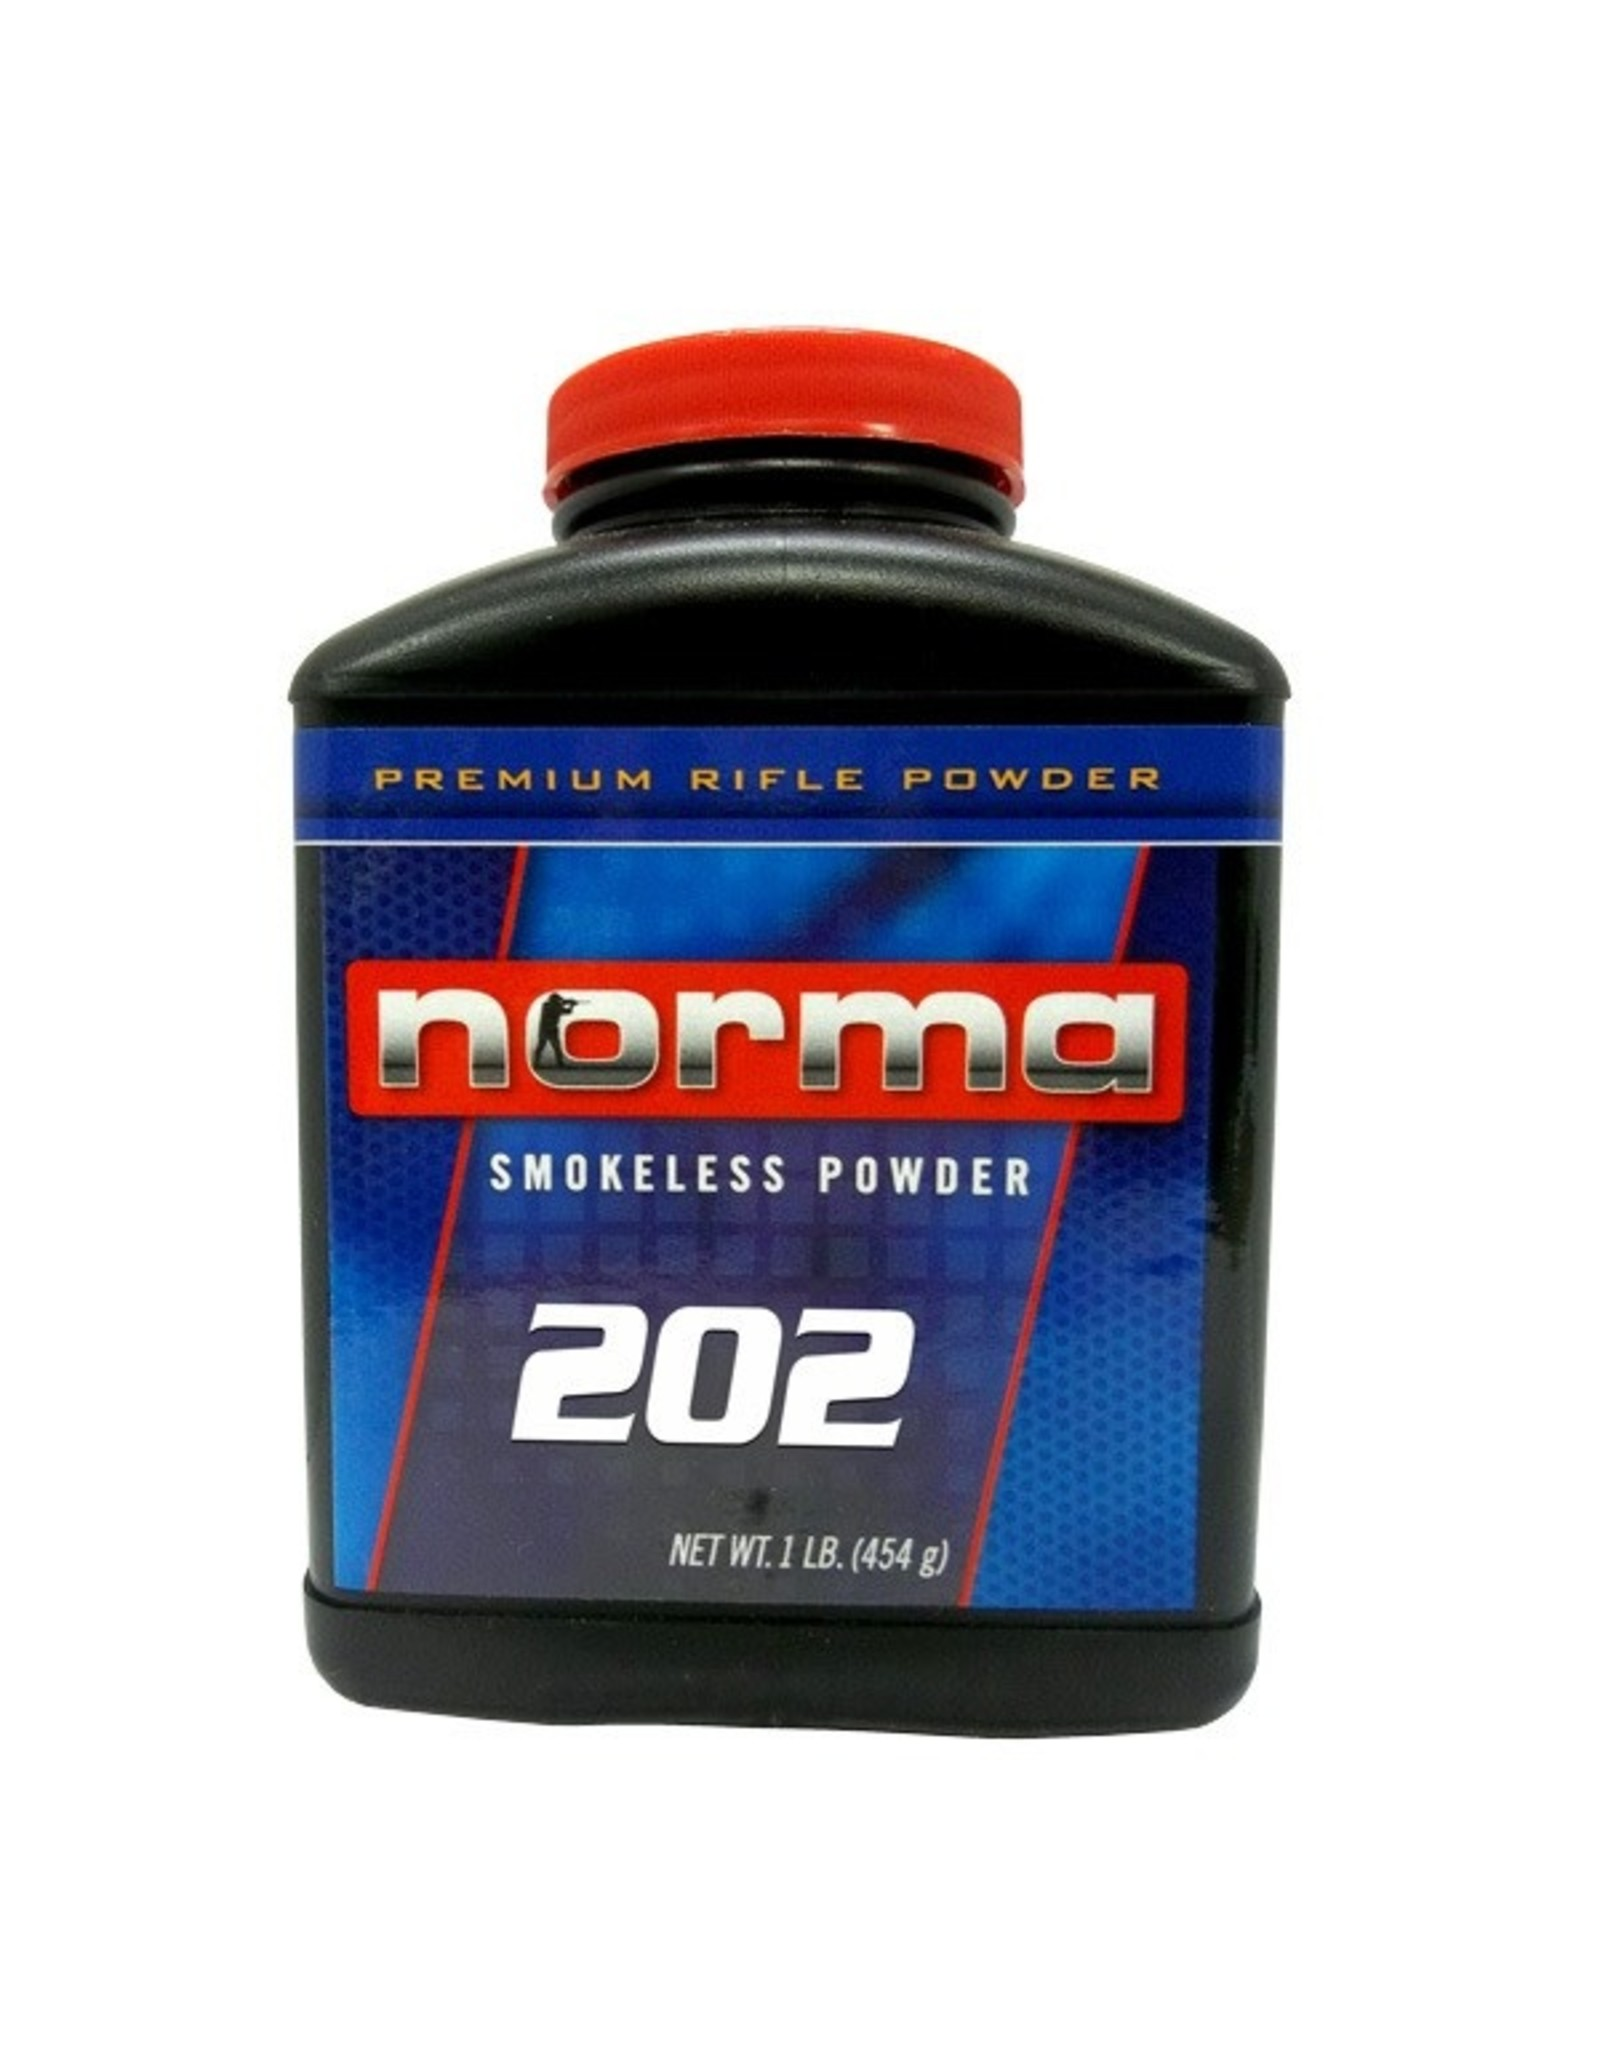 Norma Norma 202 - 1 pound